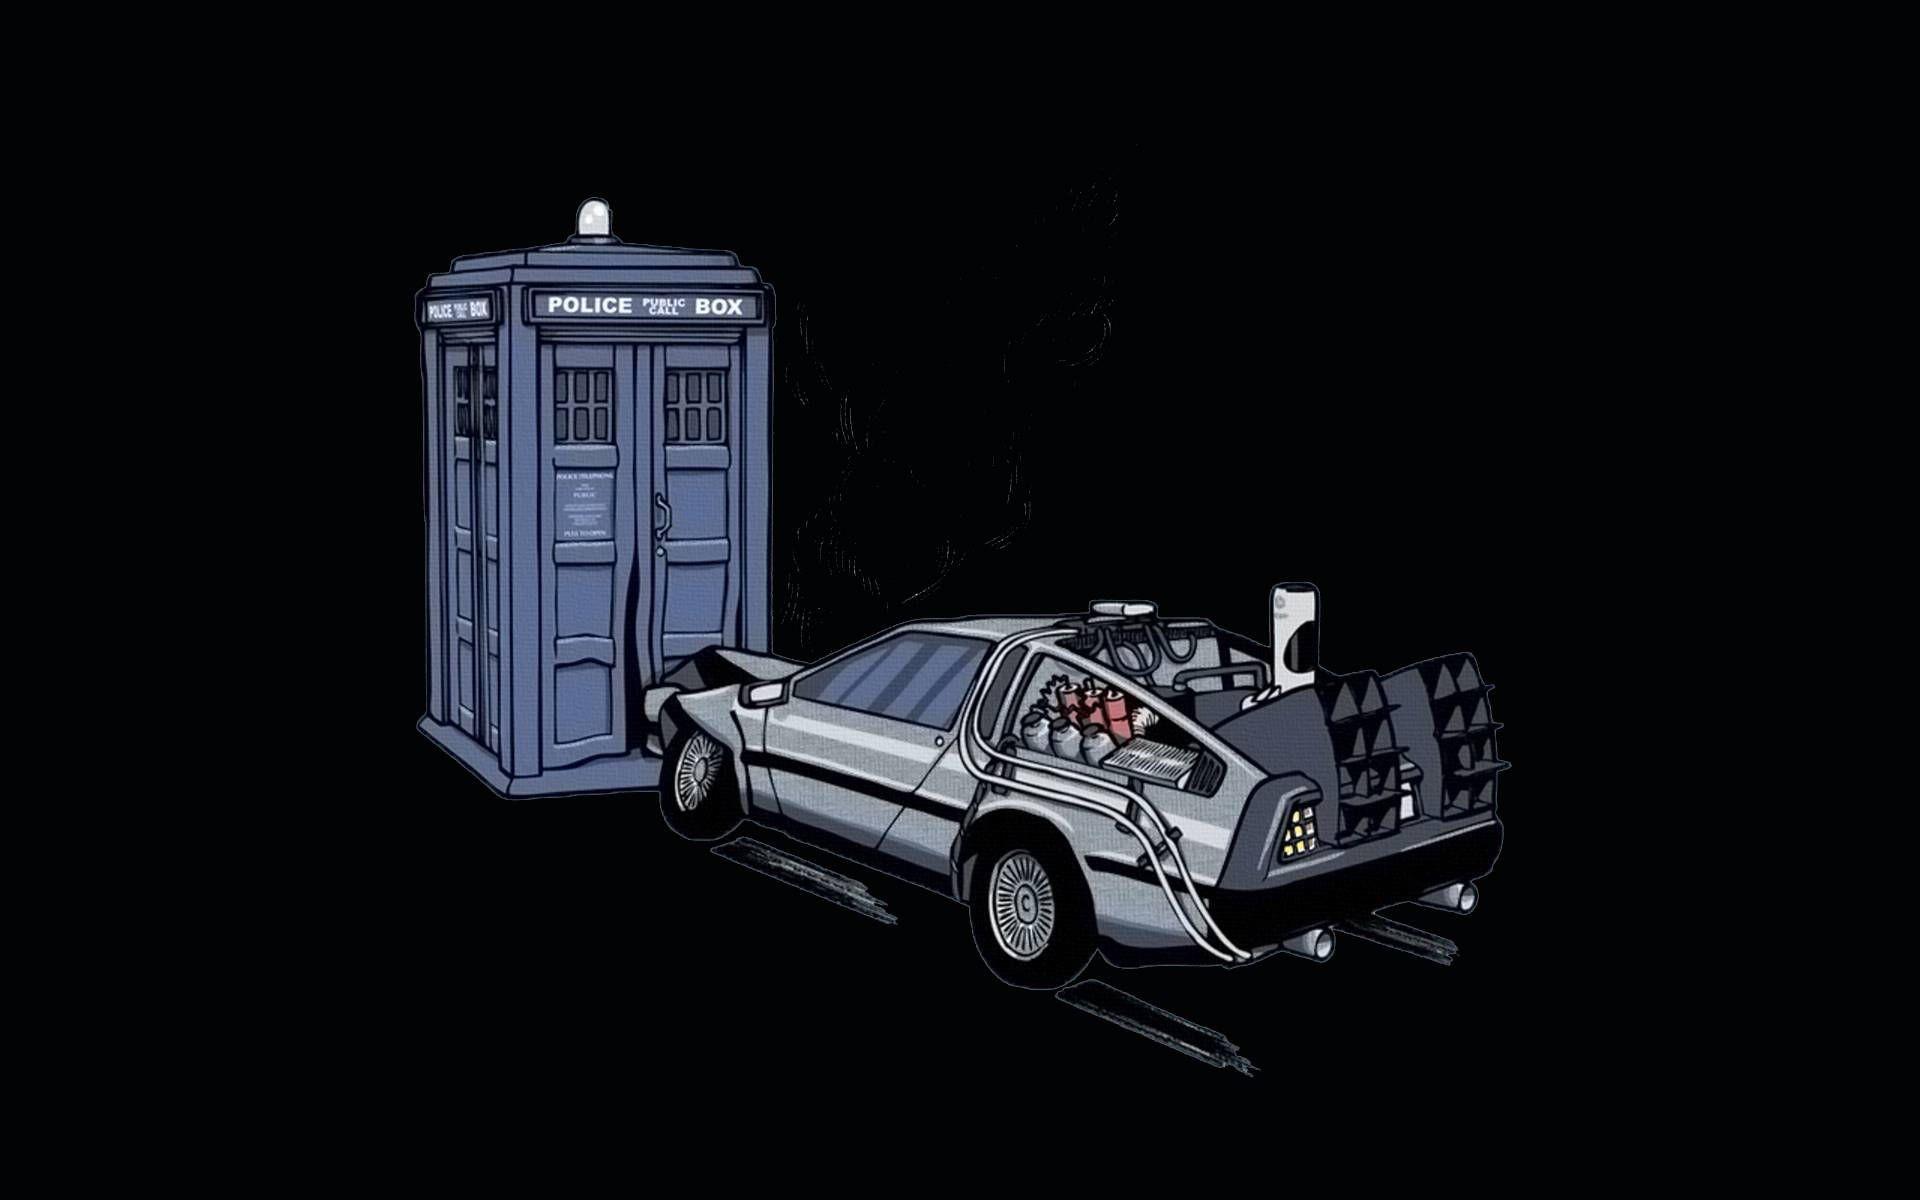 TARDIS Wallpapers (38 Wallpapers)